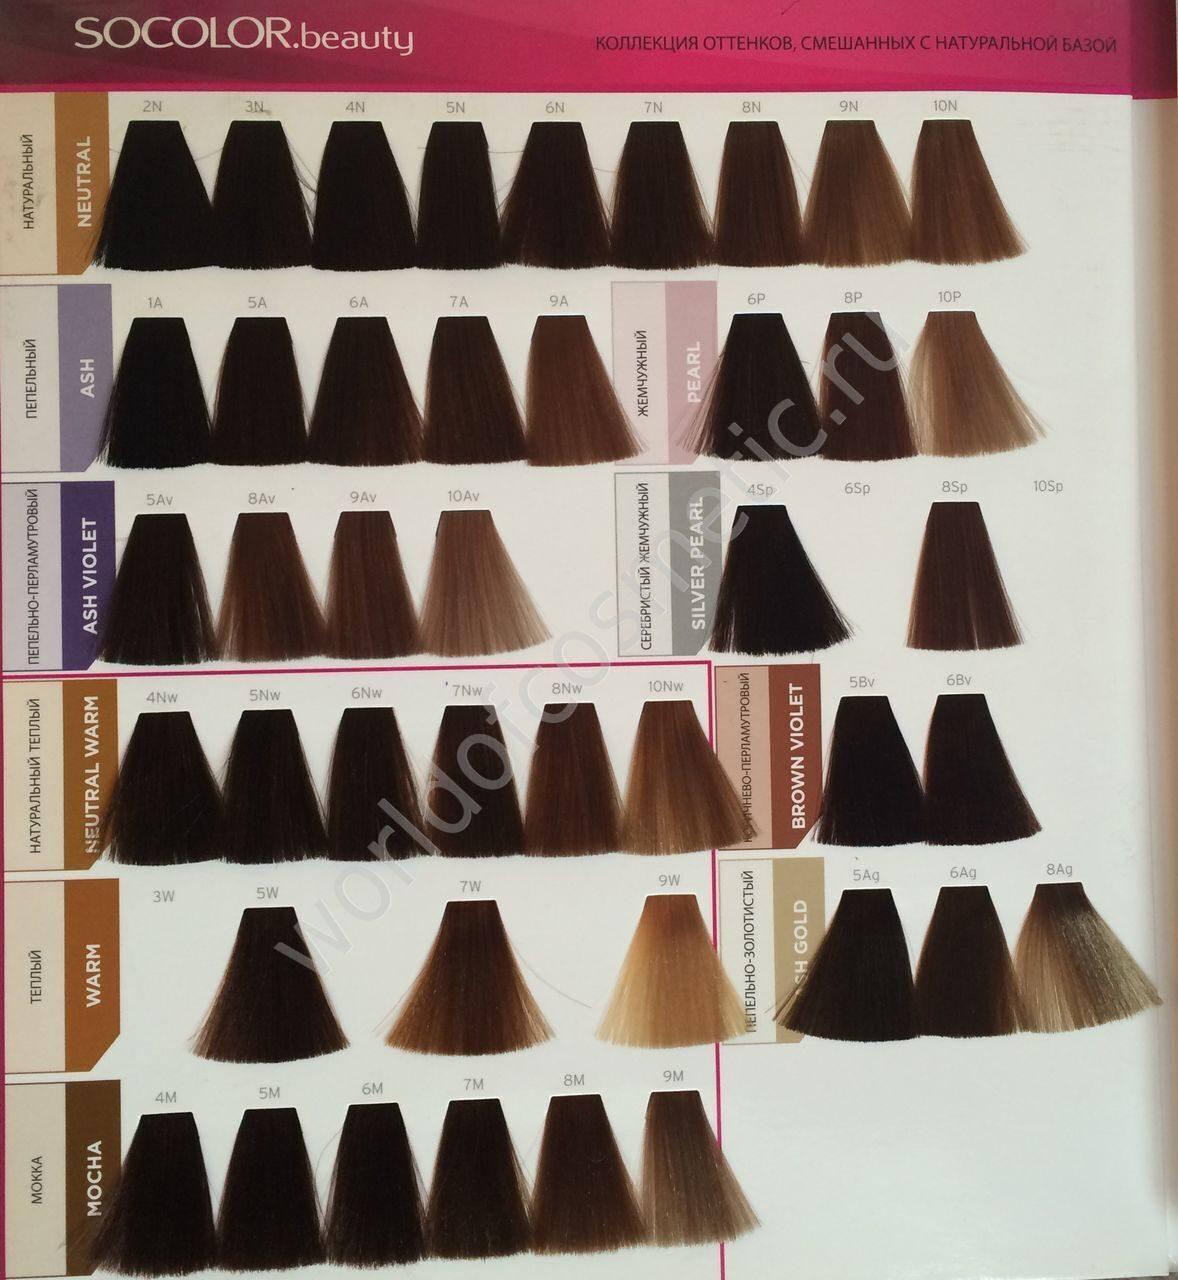 Matrix 505r dark brown hairs of matrix brown hair color chart matrix beauty color newhairstylesformen2014com nvjuhfo Images